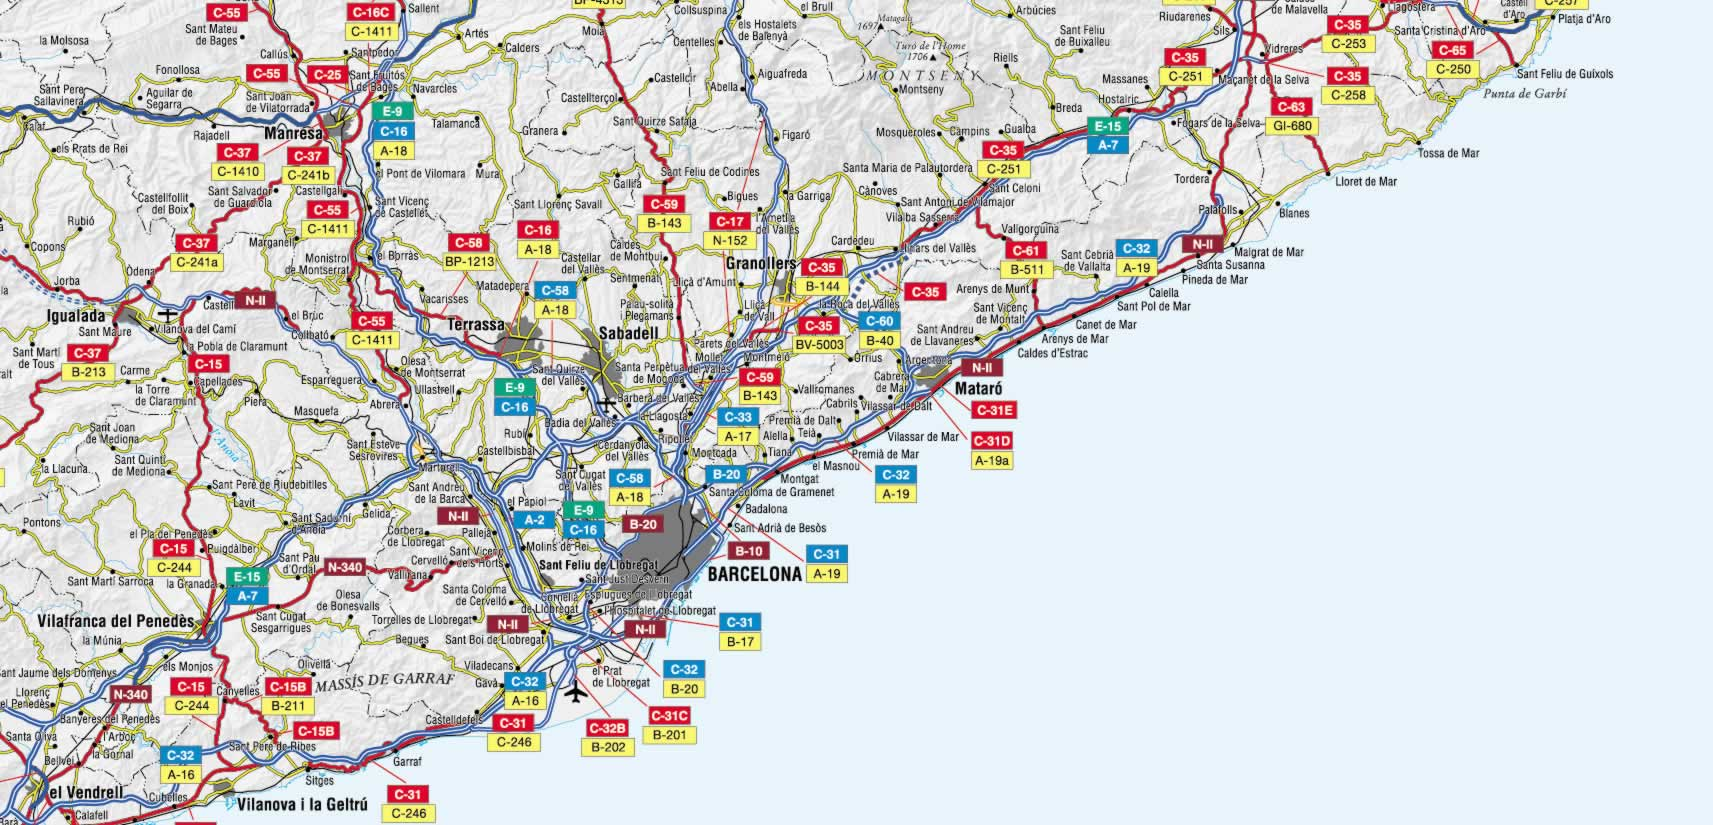 Mapa de carreteras de la Provincia de Barcelona